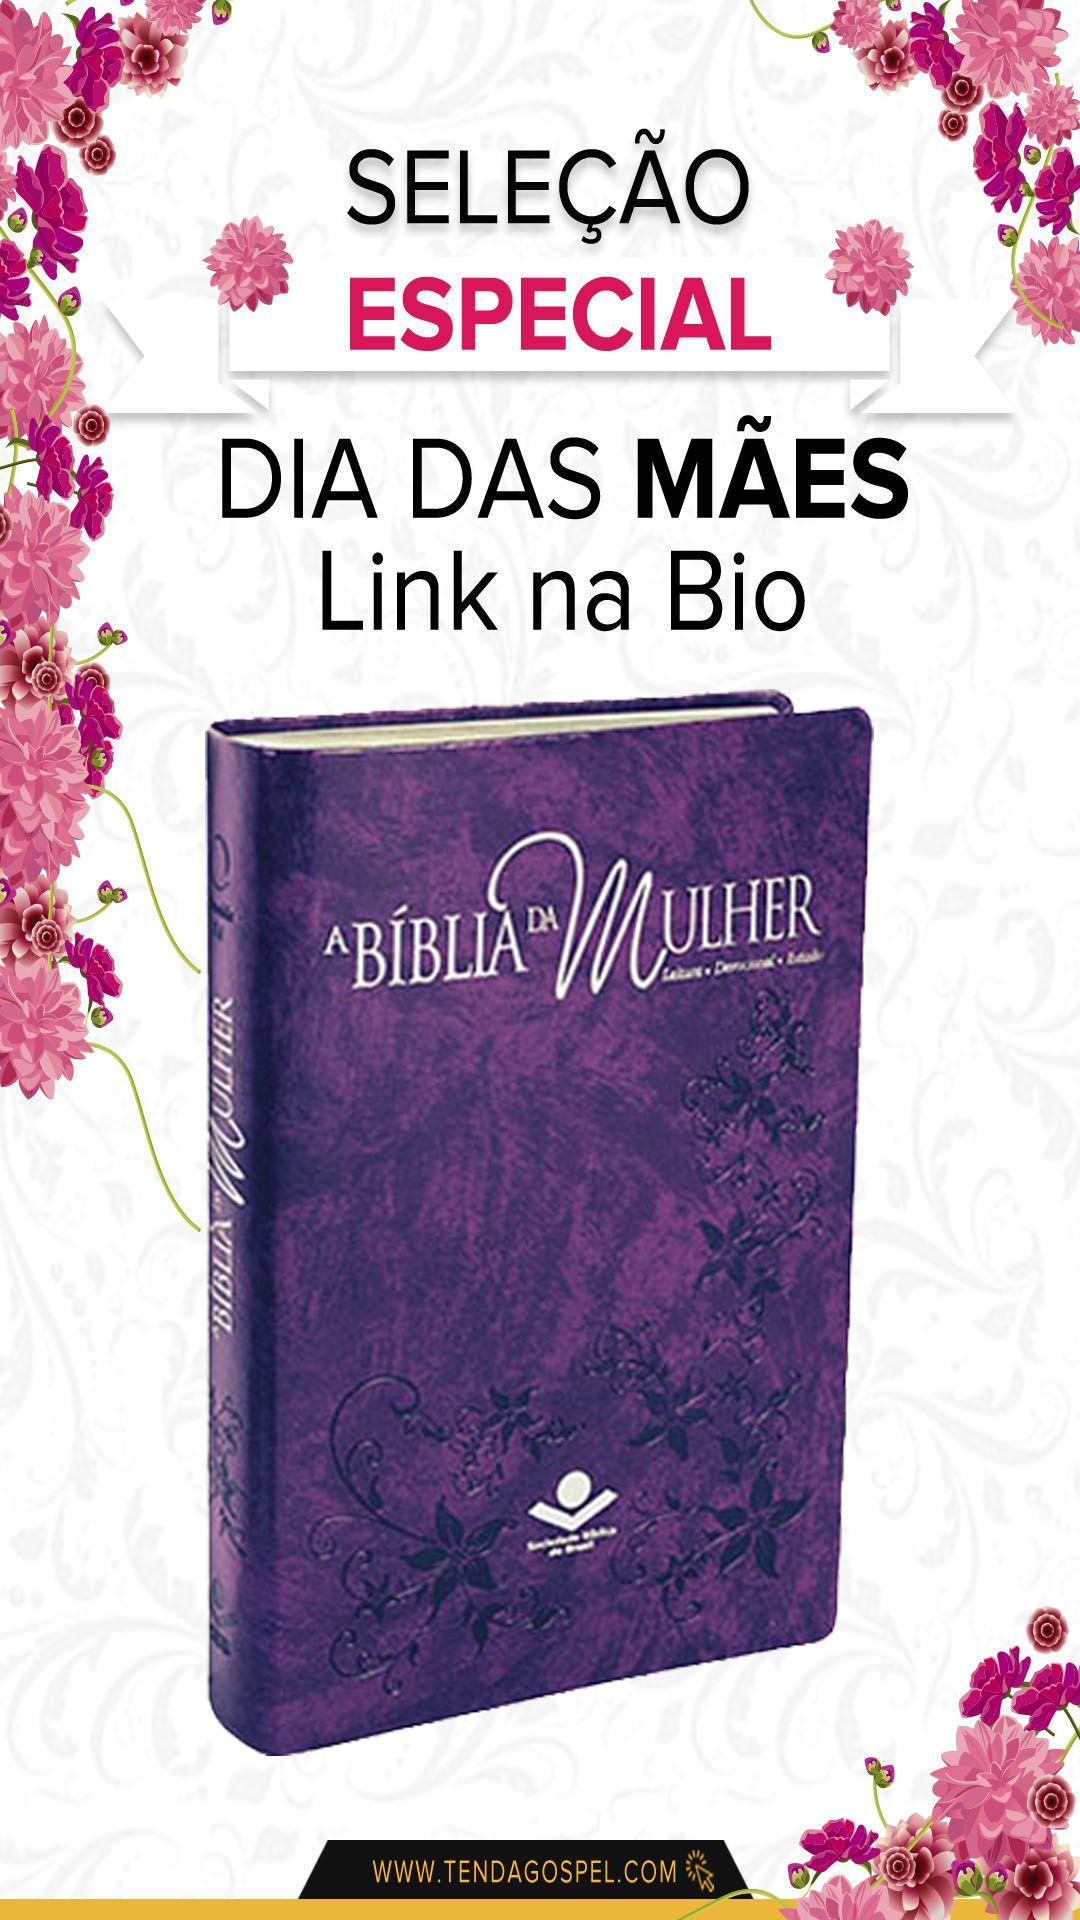 Livrariatendagospel Sbb Abibliadamulher Biblia